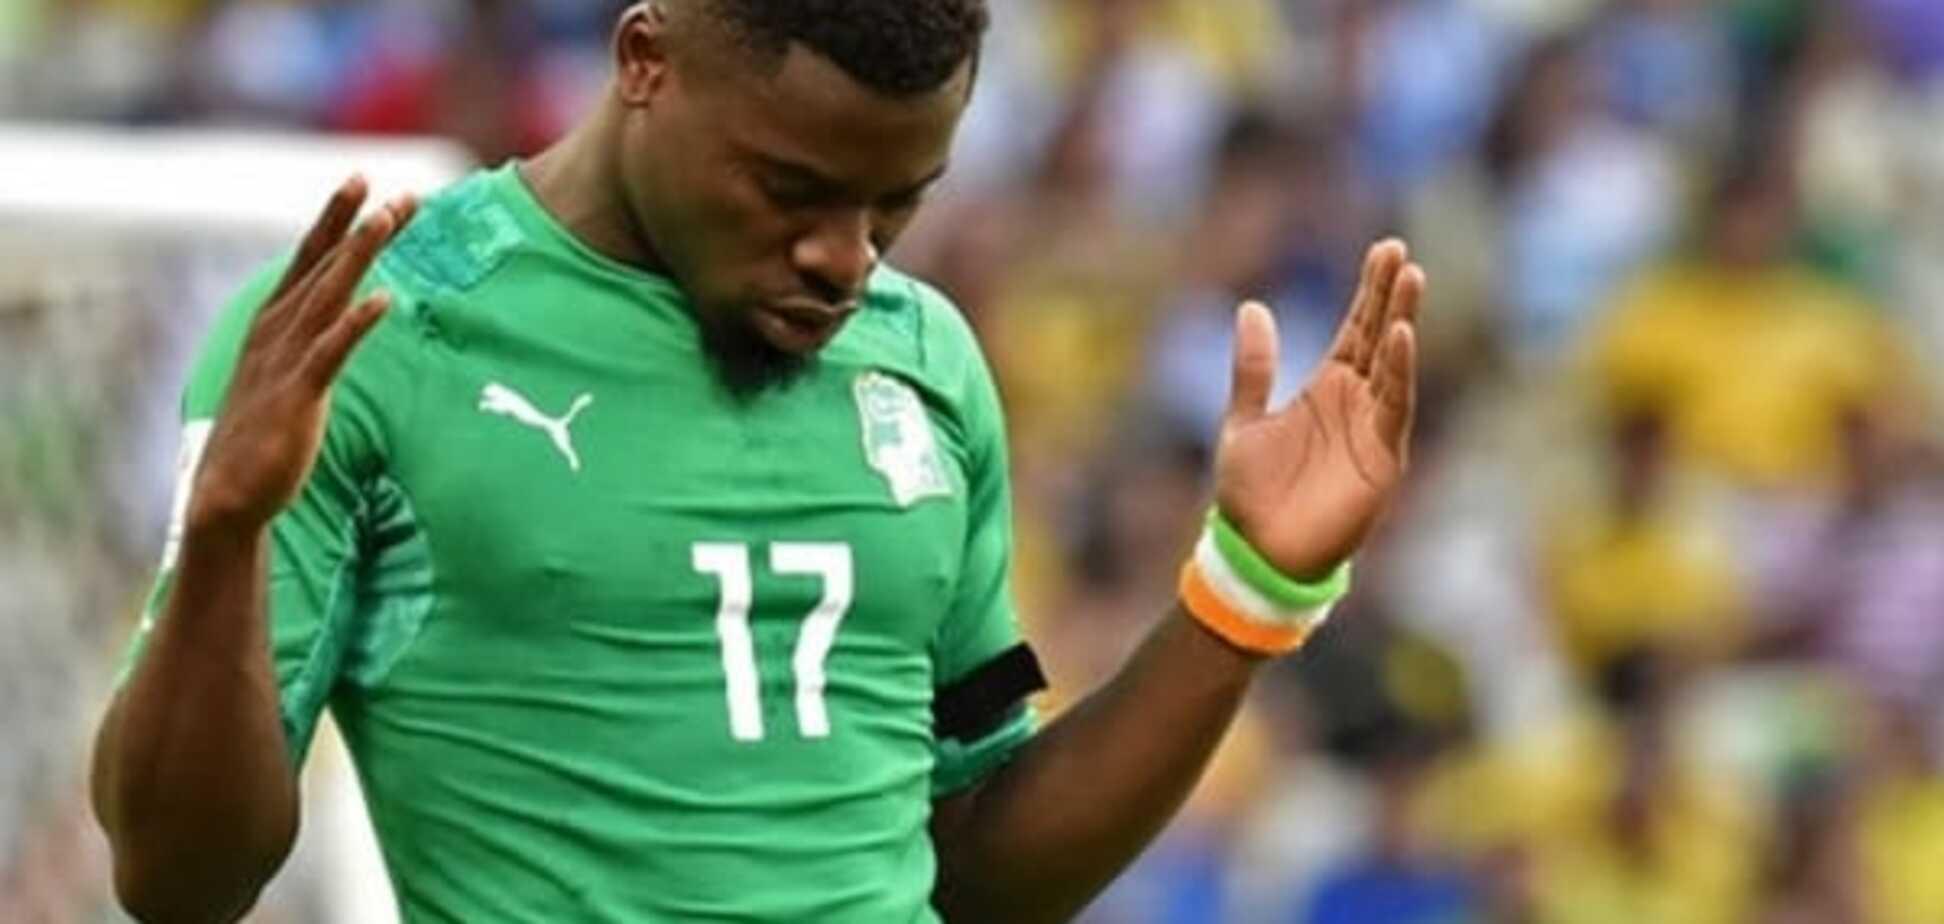 Африканский футболист спас своего противника от смерти на поле: видео момента